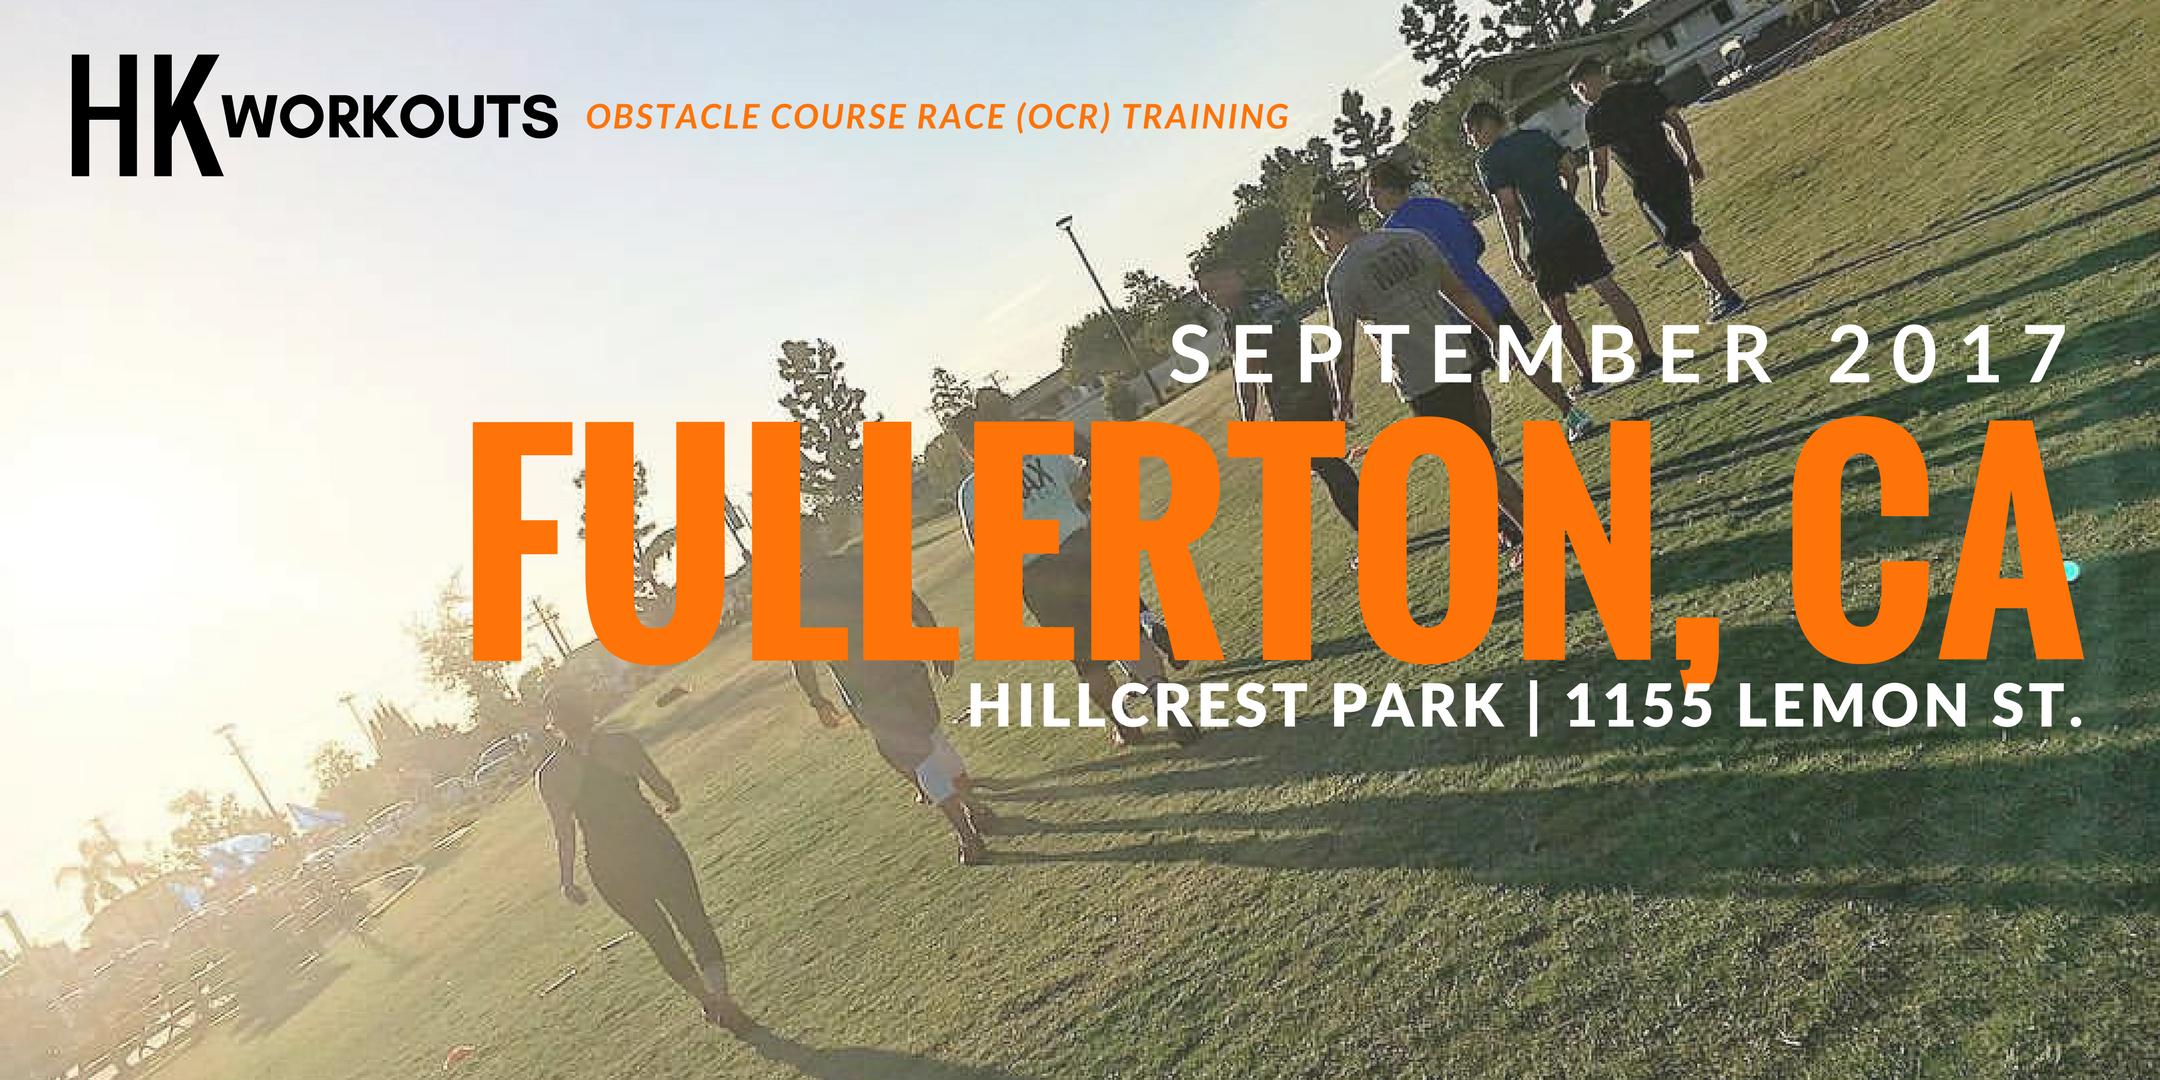 HARDKOUR WORKOUTS - Fullerton, CA // 09.30.17